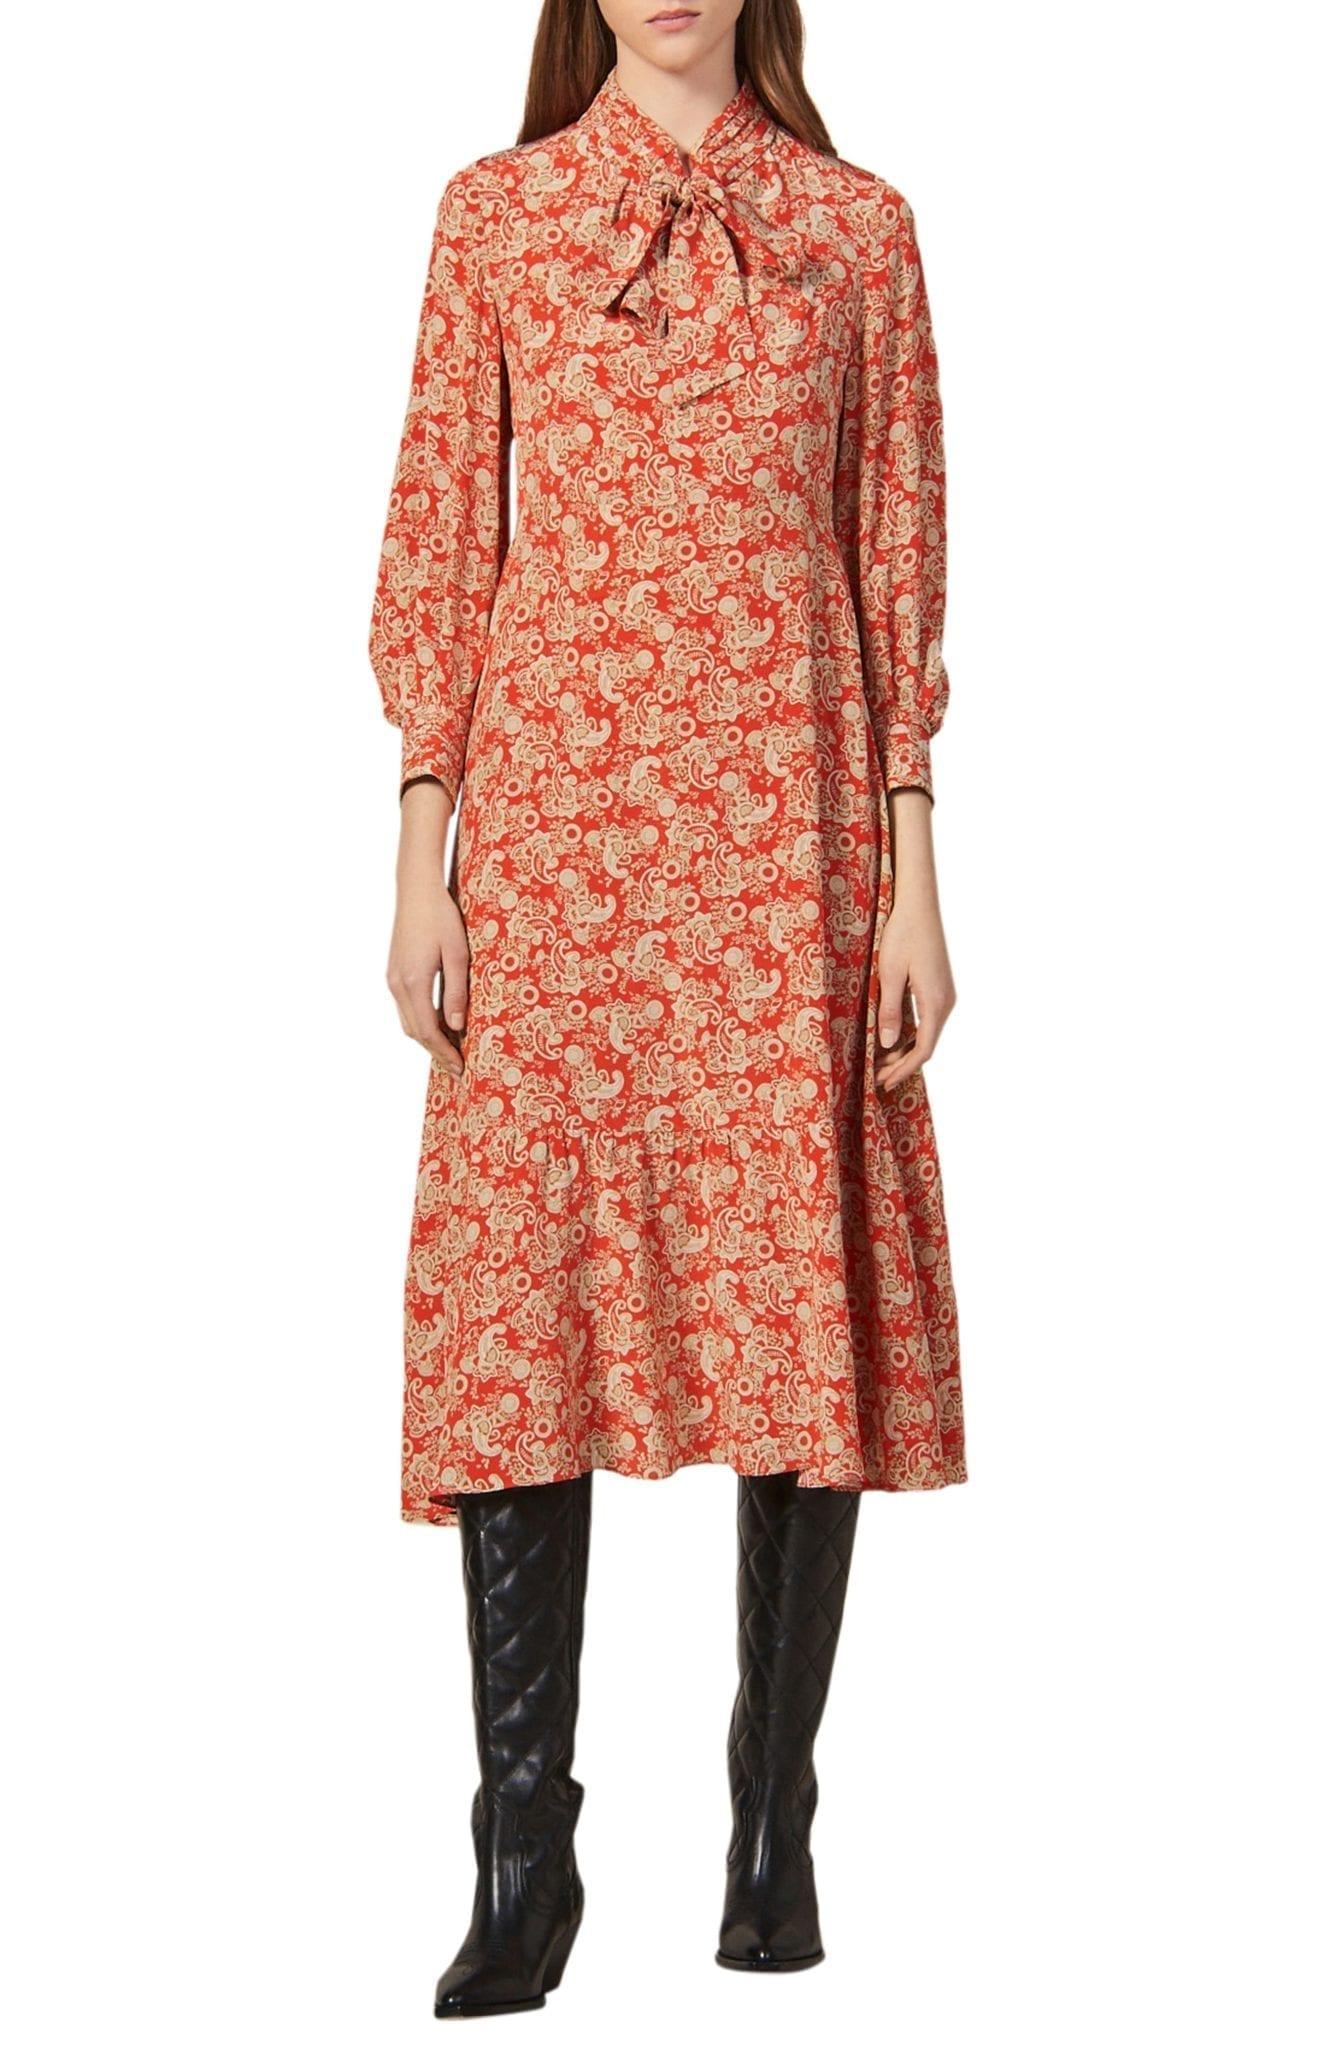 SANDRO Lanelle Paisley Tie Neck Midi Silk Dress